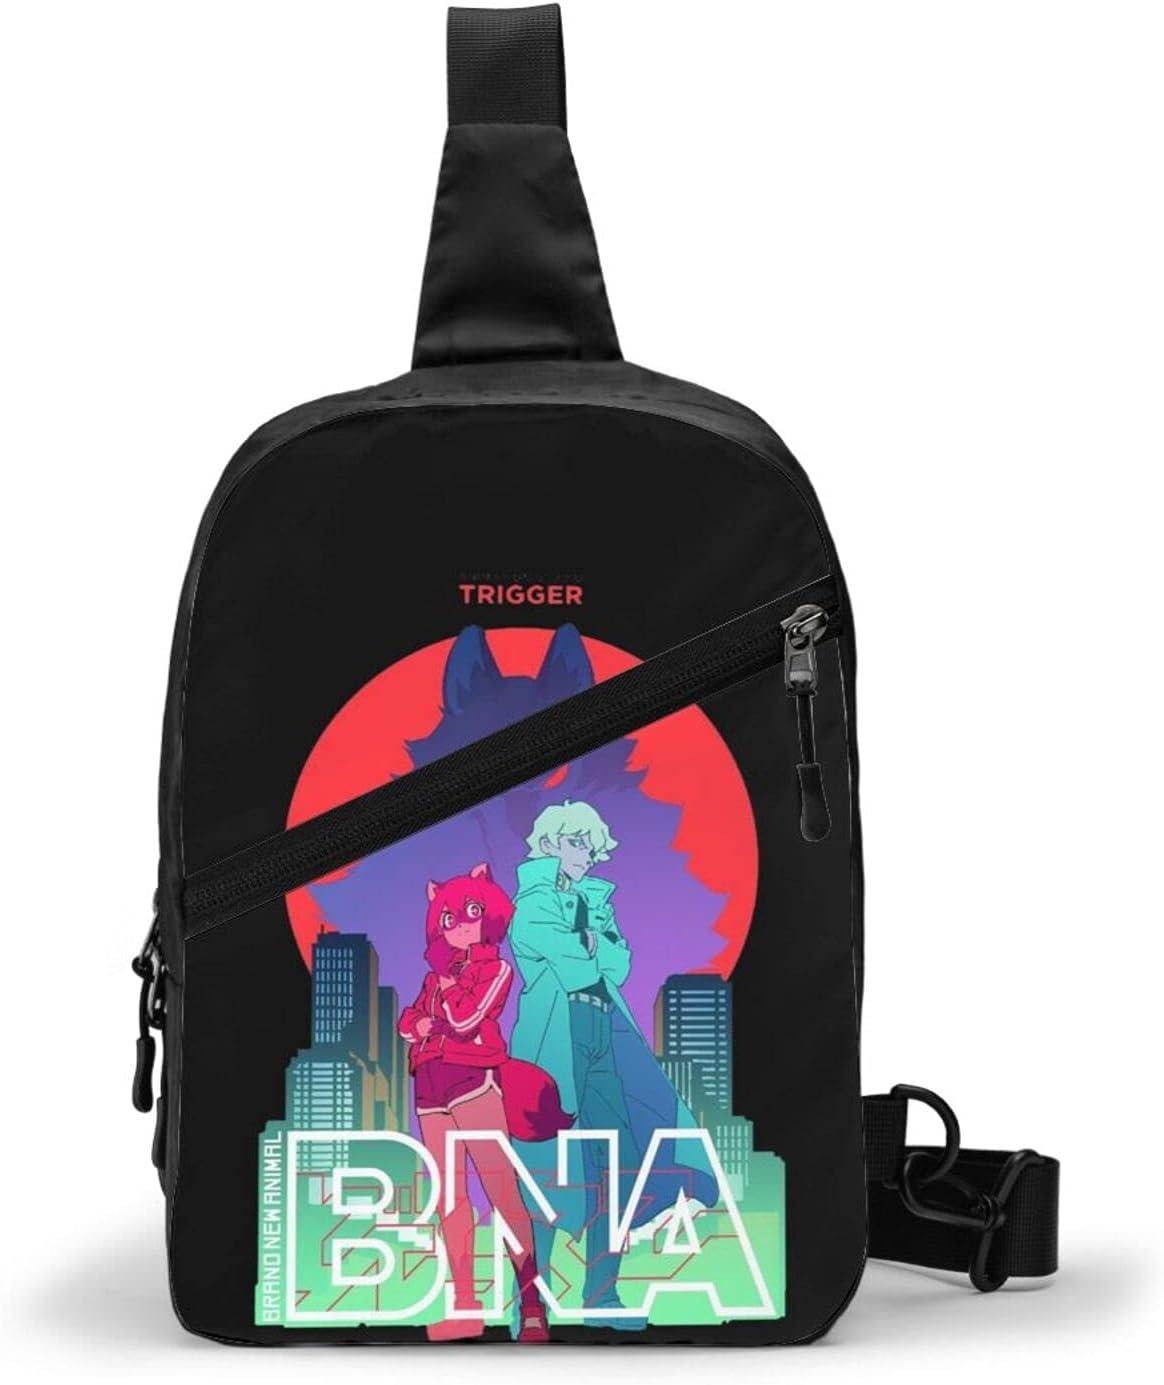 Trioepu Bna Max 89% OFF Anime Shoulder Bag Daypac Men Women 5 popular Hiking Crossbody